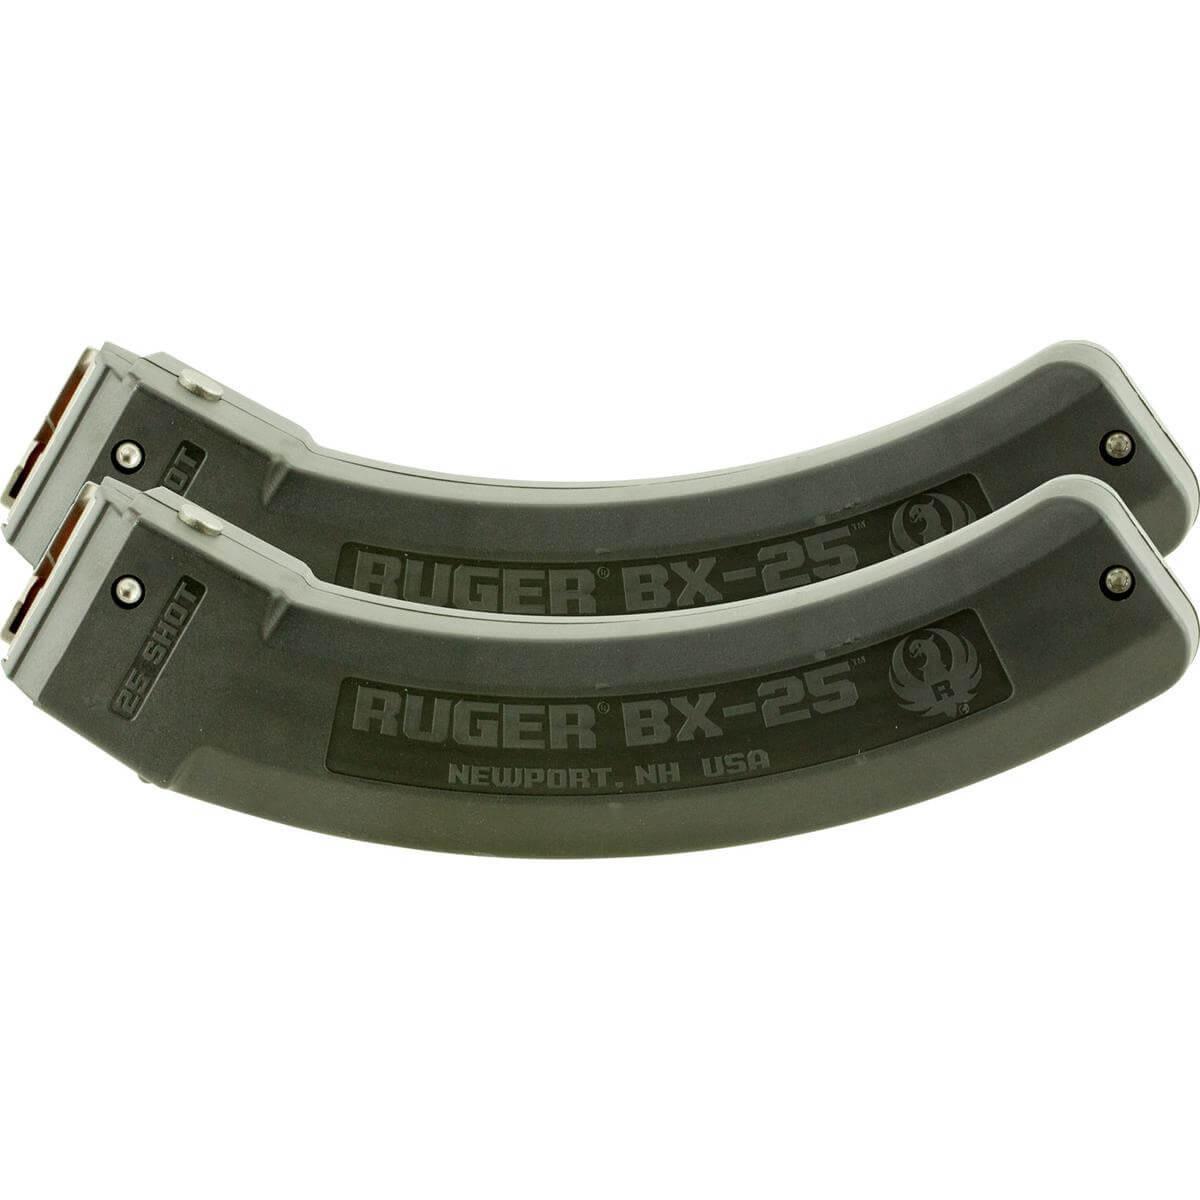 PRÉ-VENDA - Carregador Rifle Ruger® BX-25 Calibre 22LR